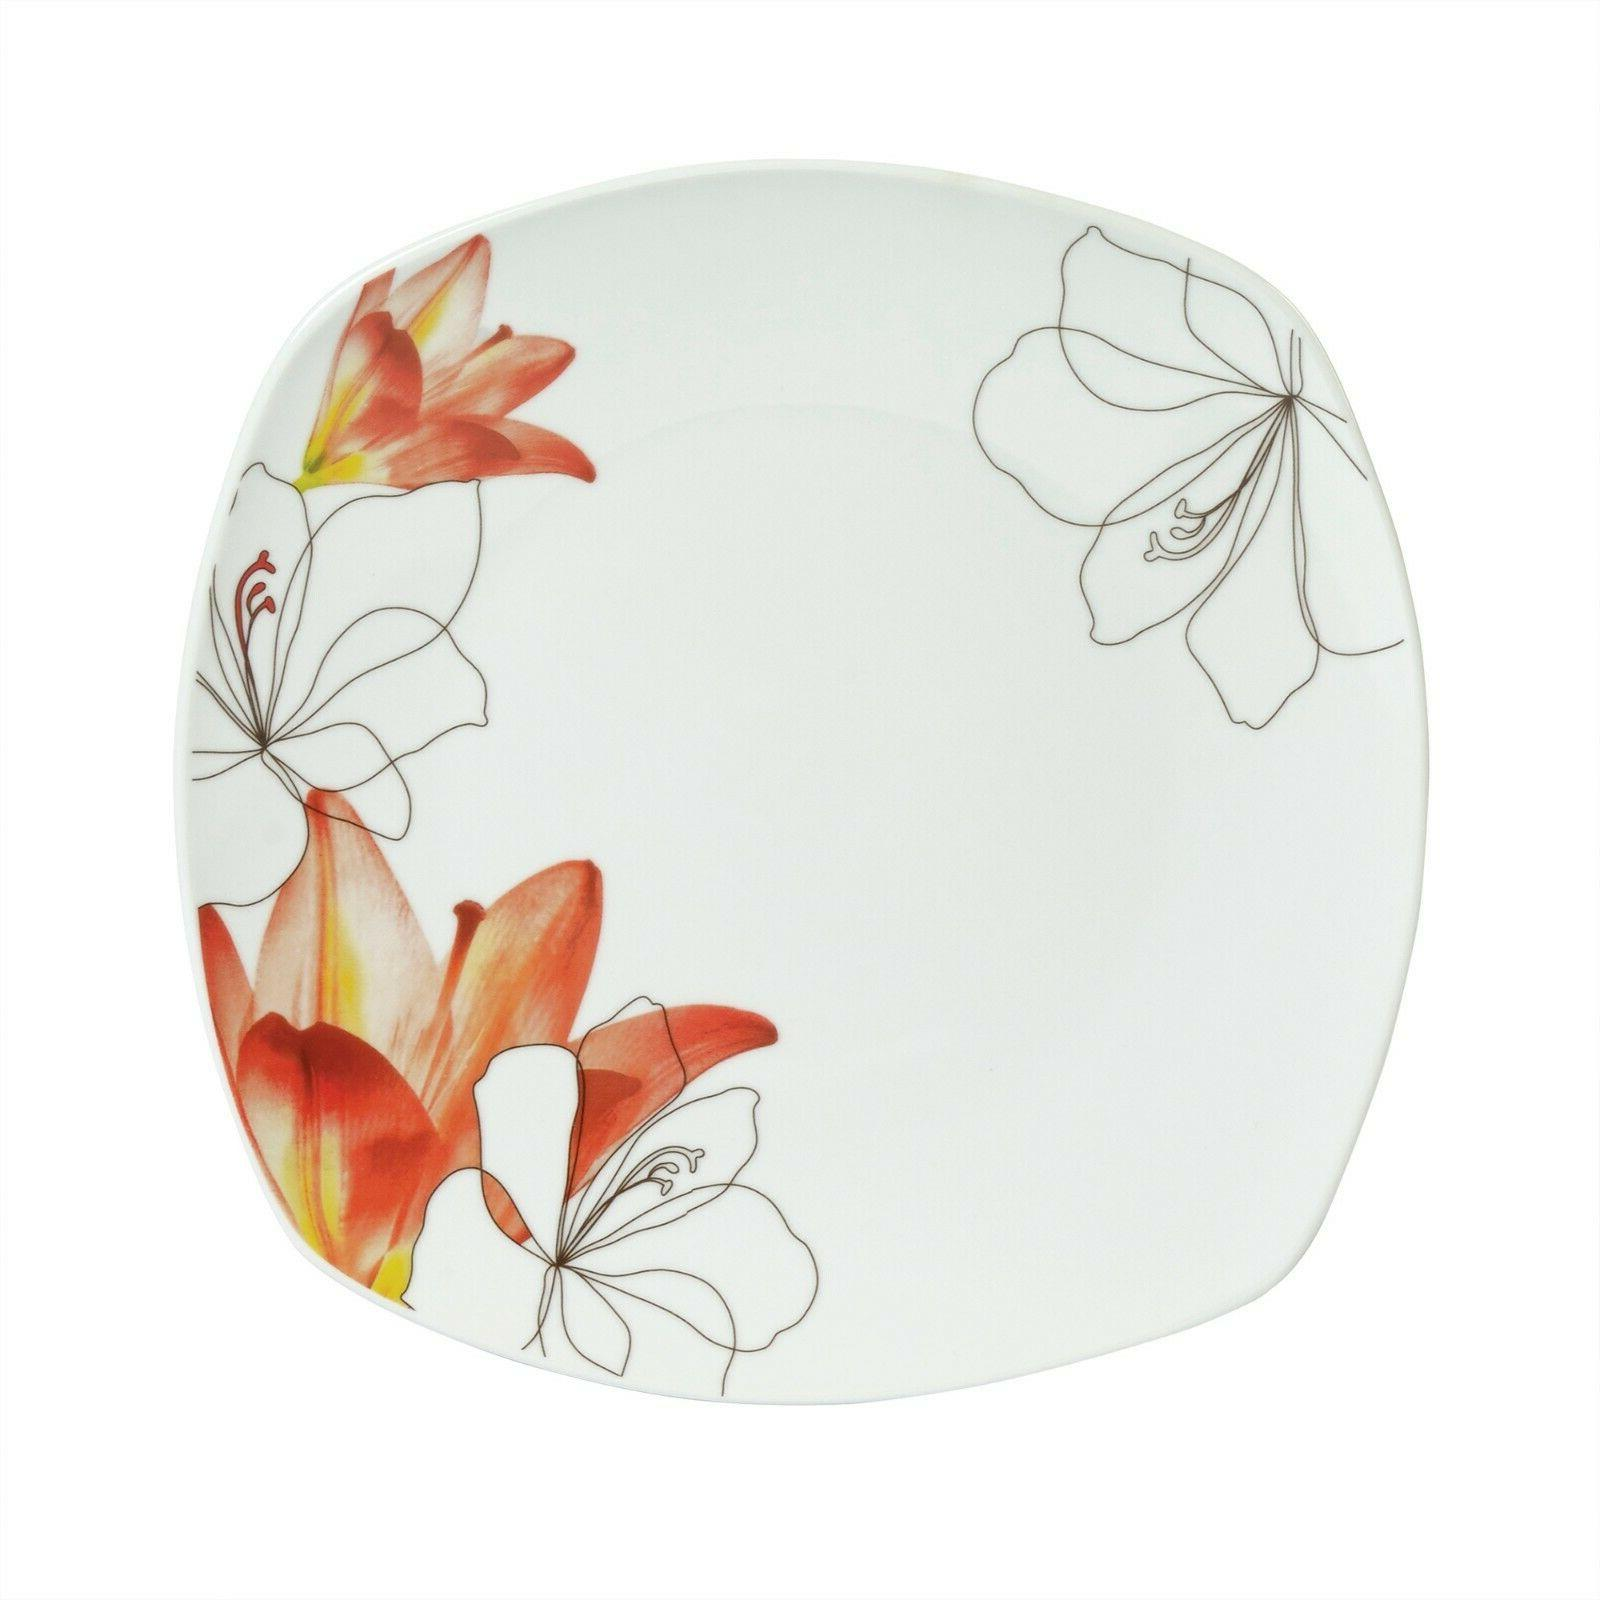 16 Piece Leaves Set Square Dishwasher Freezer Microwave Ceramic